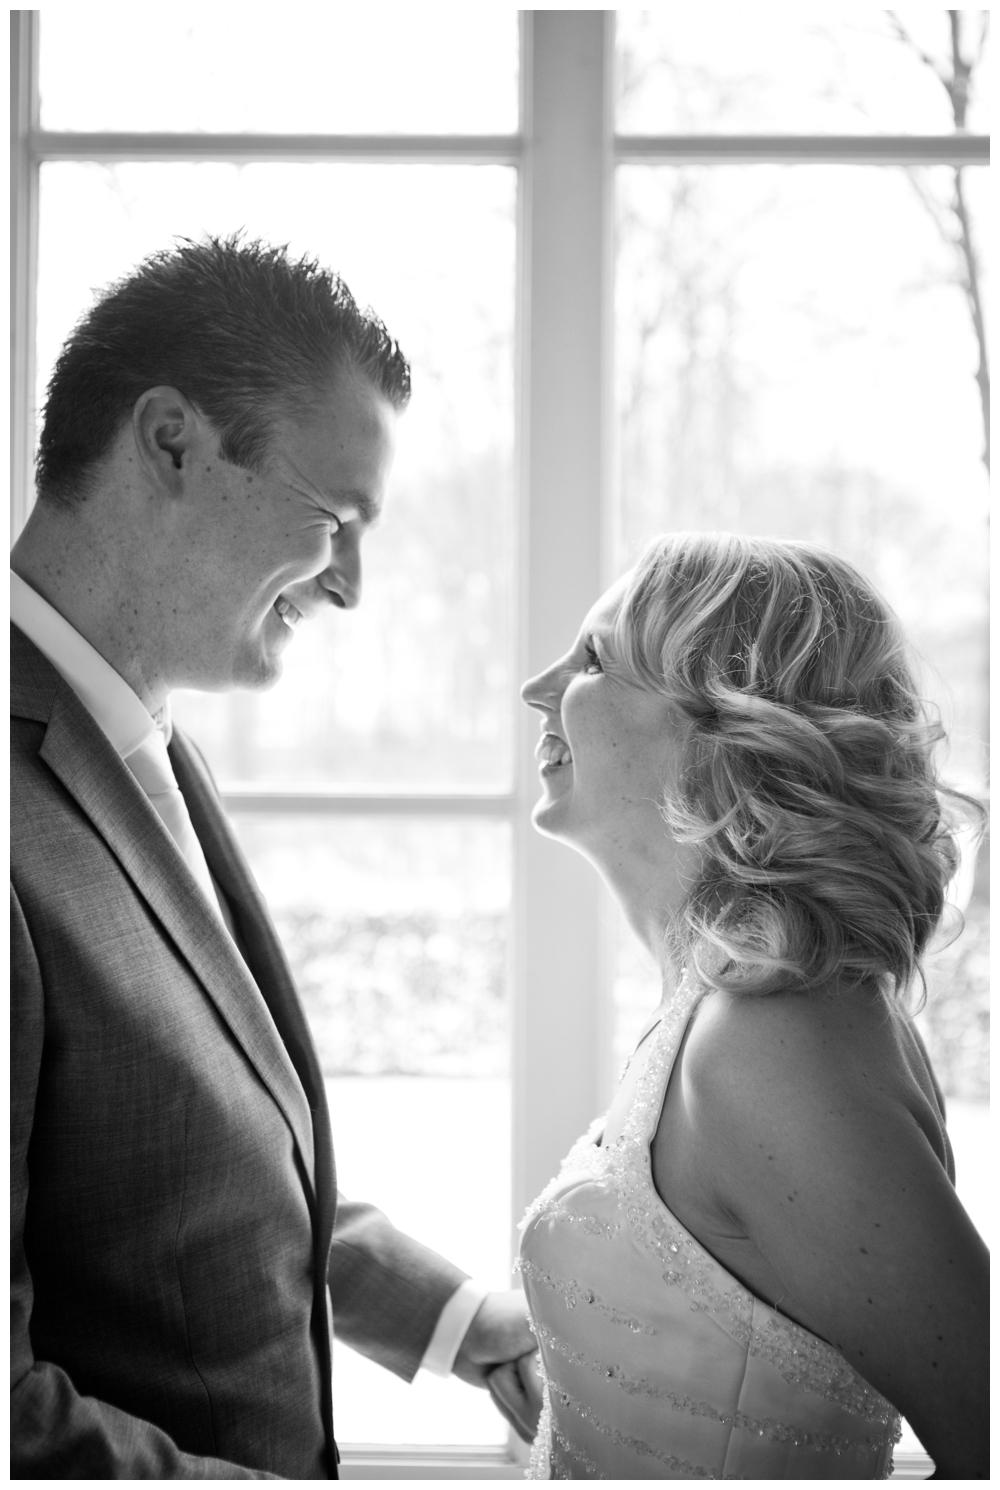 Wedding Robbert&Marlon ZW065.jpg